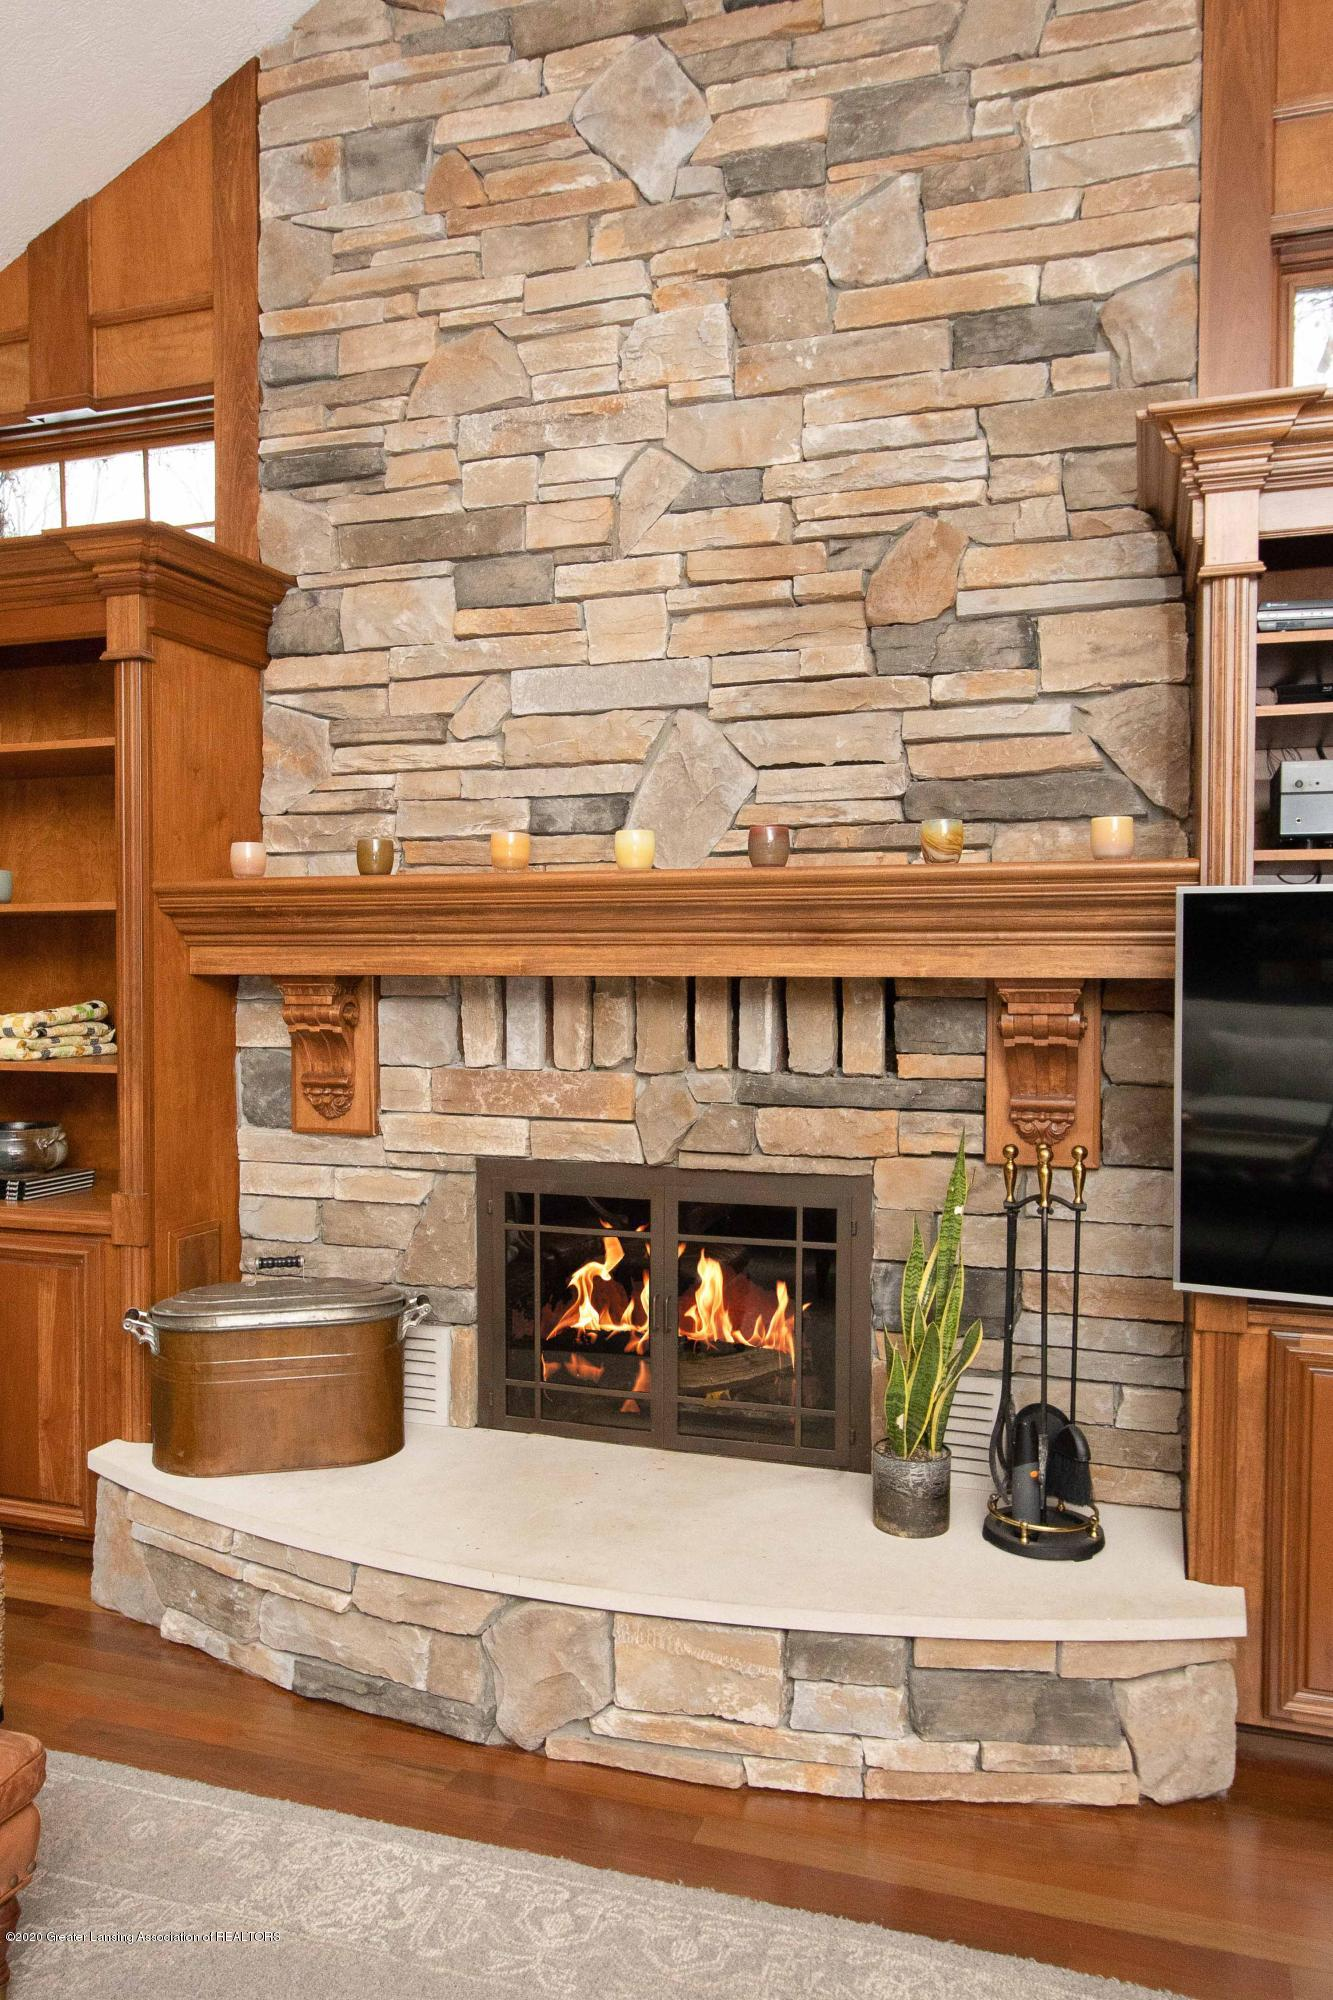 3631 Beech Tree Ln - 3631 Beech Tree Family Room Fireplace - 24